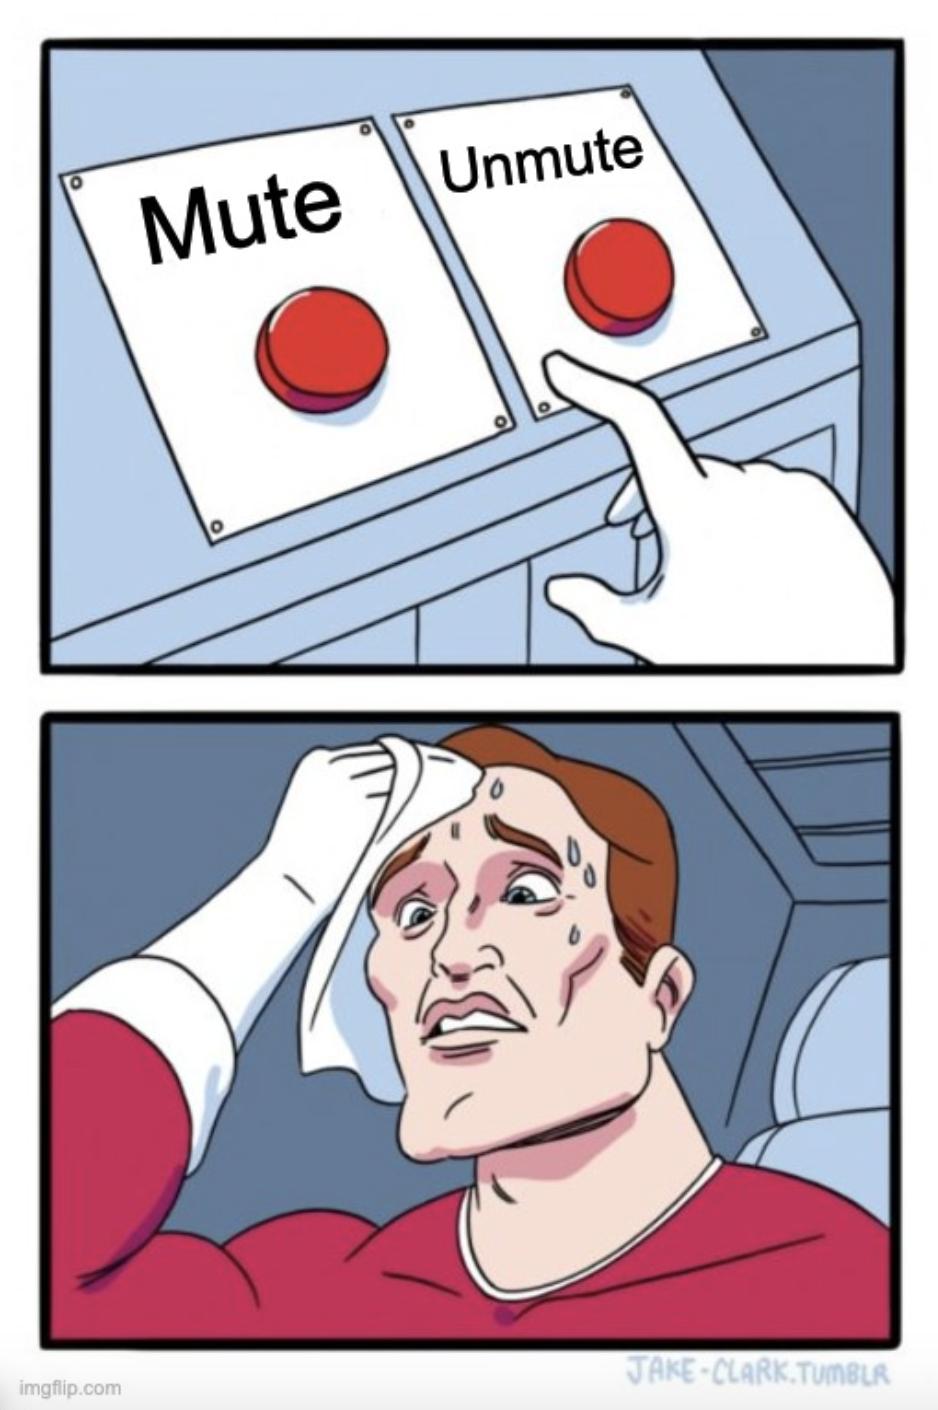 MuteMeme